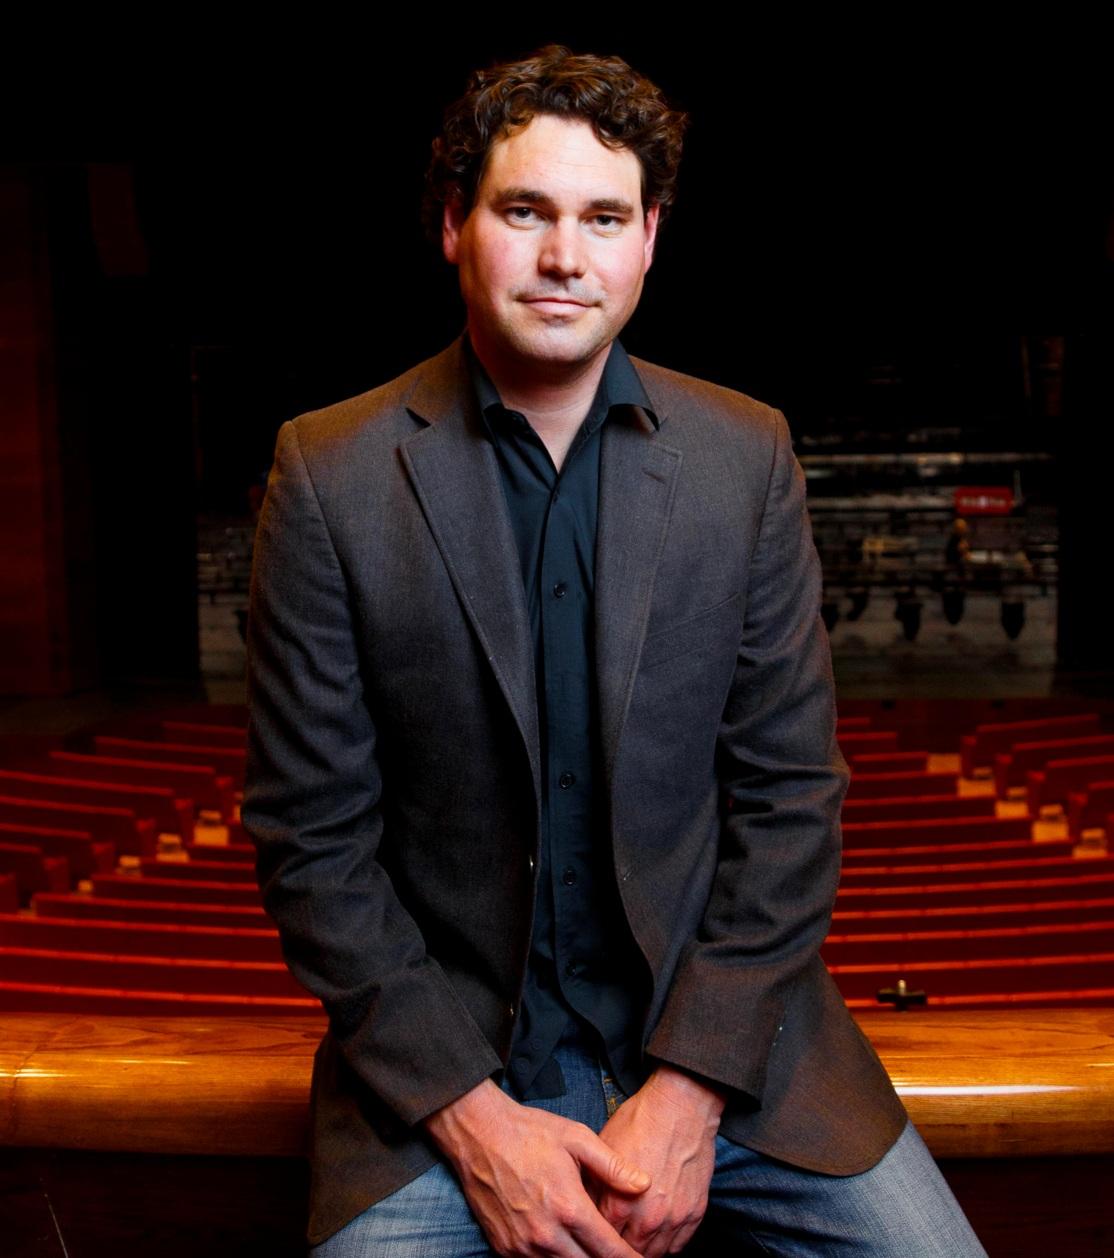 Brady Beaubien, CineConcerts co-Producer